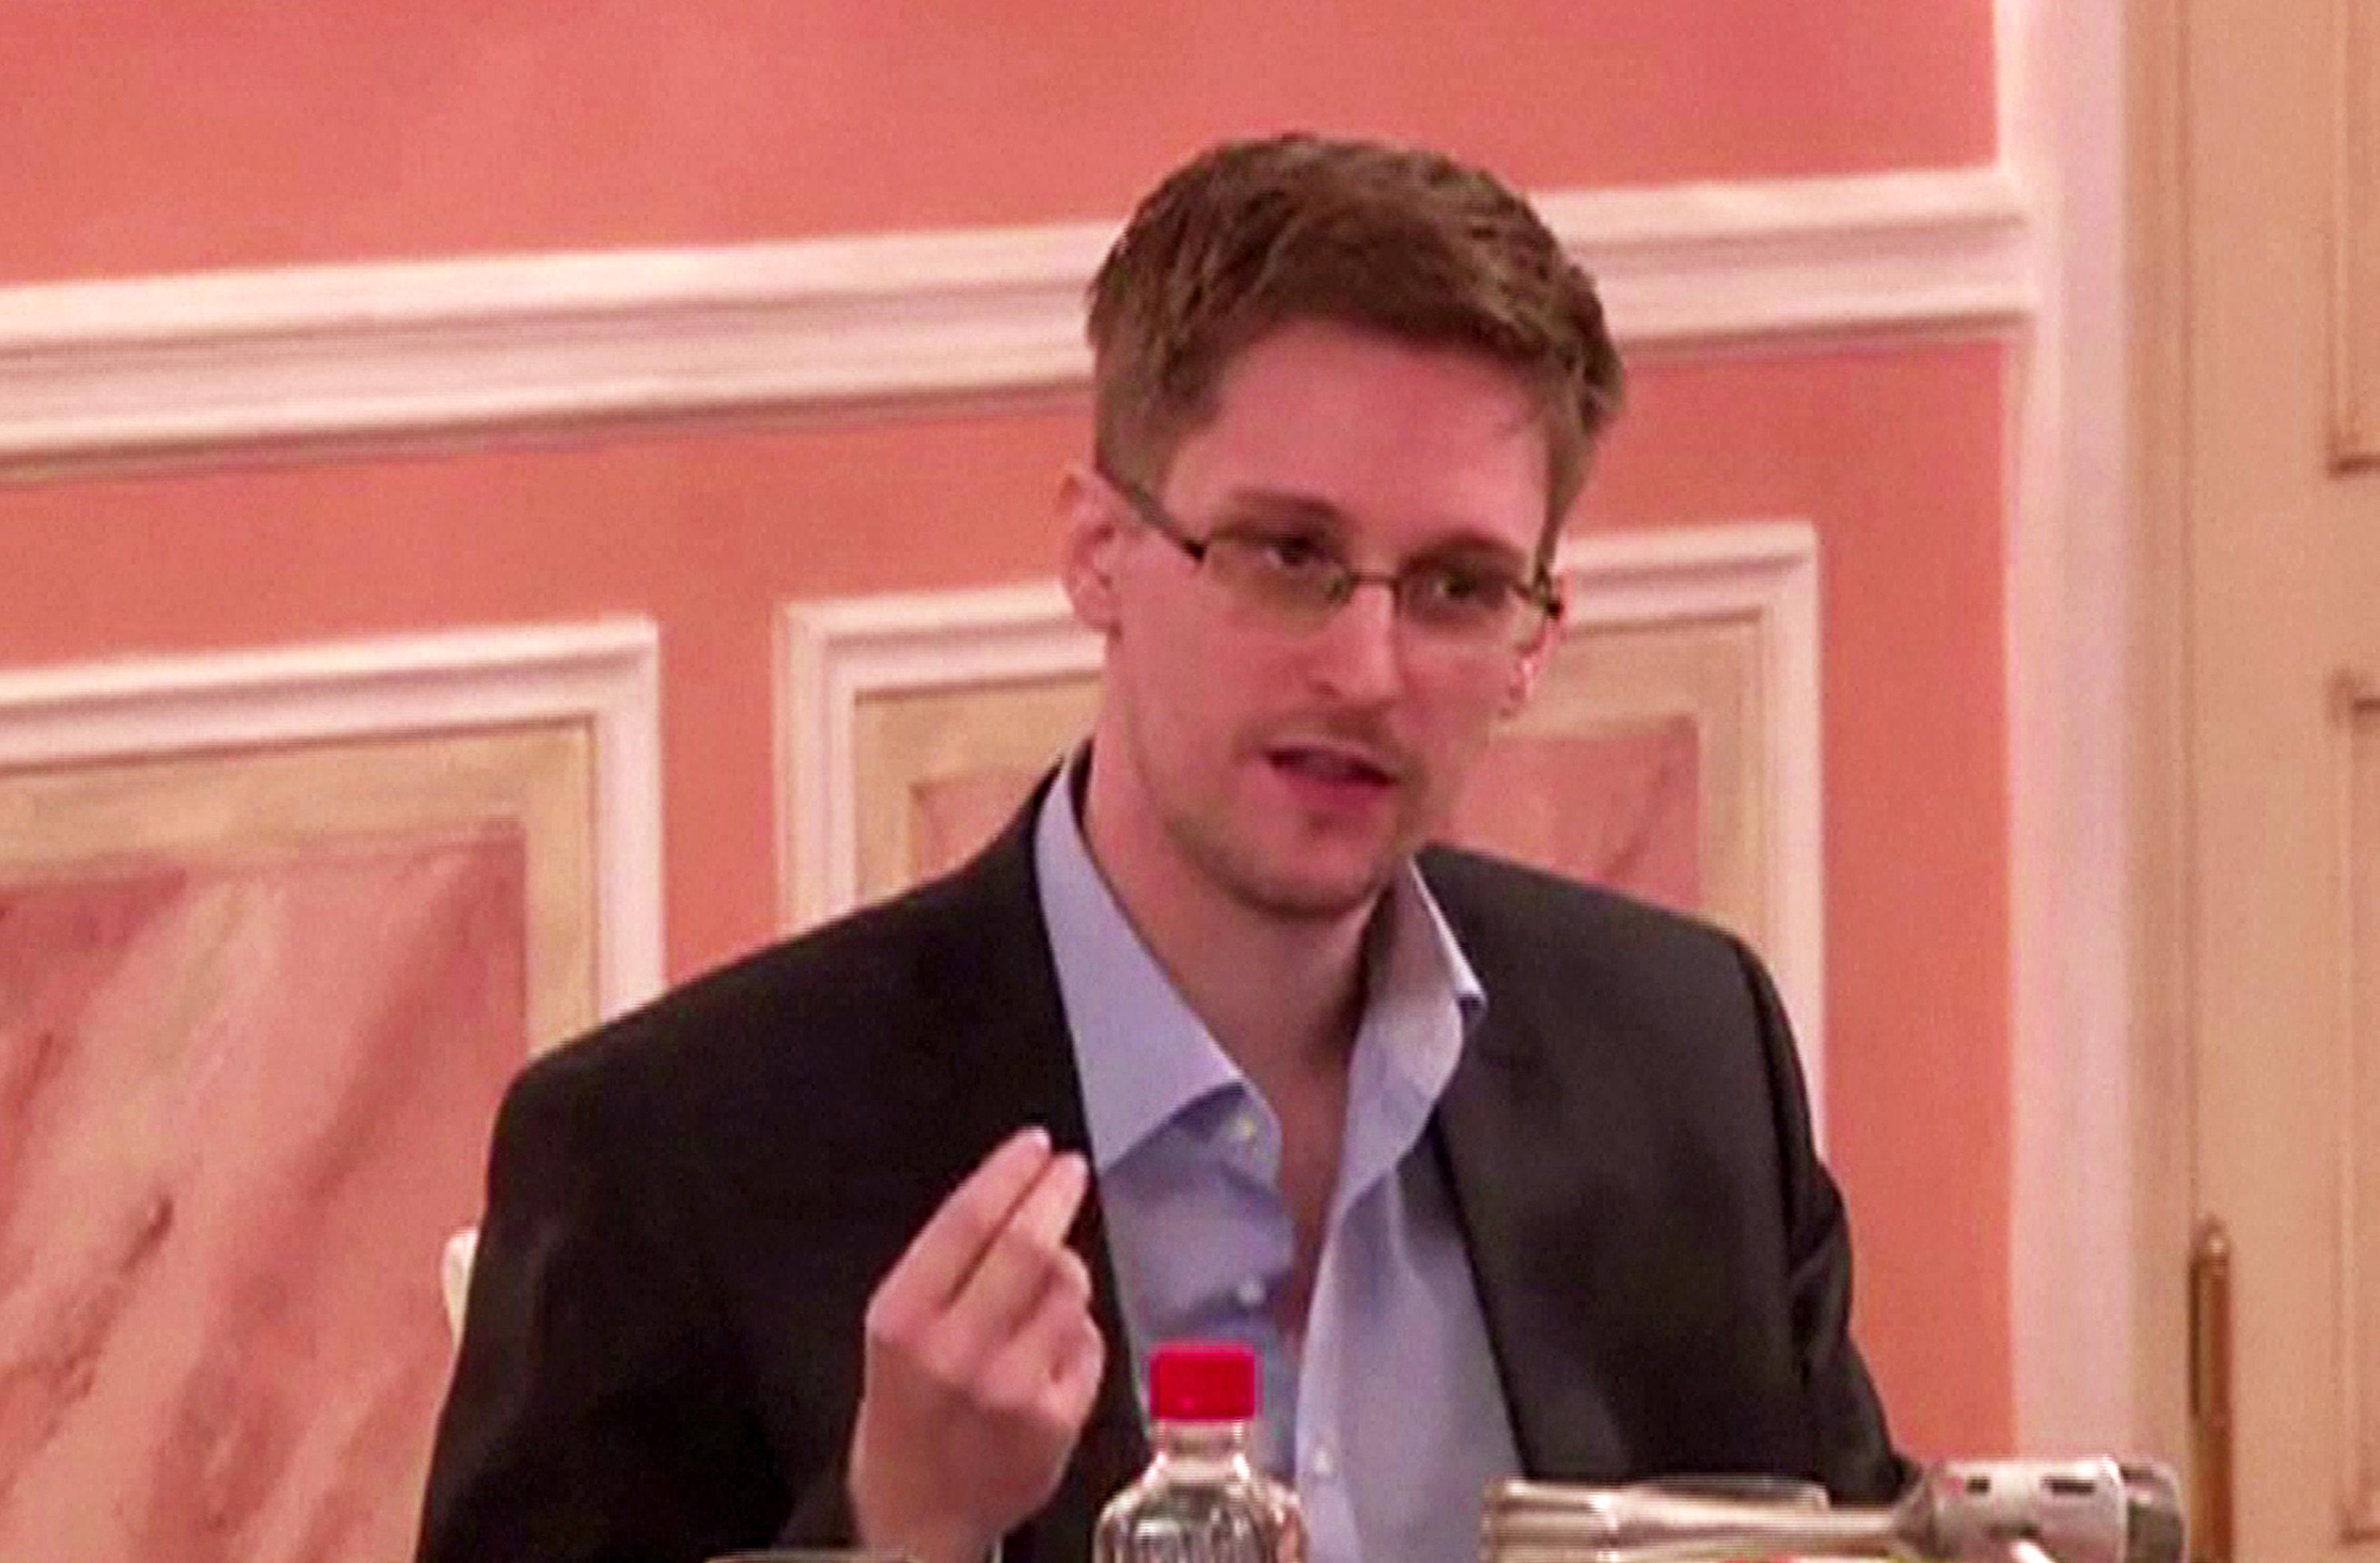 Edward Snowden is seen on October 9, 2013.